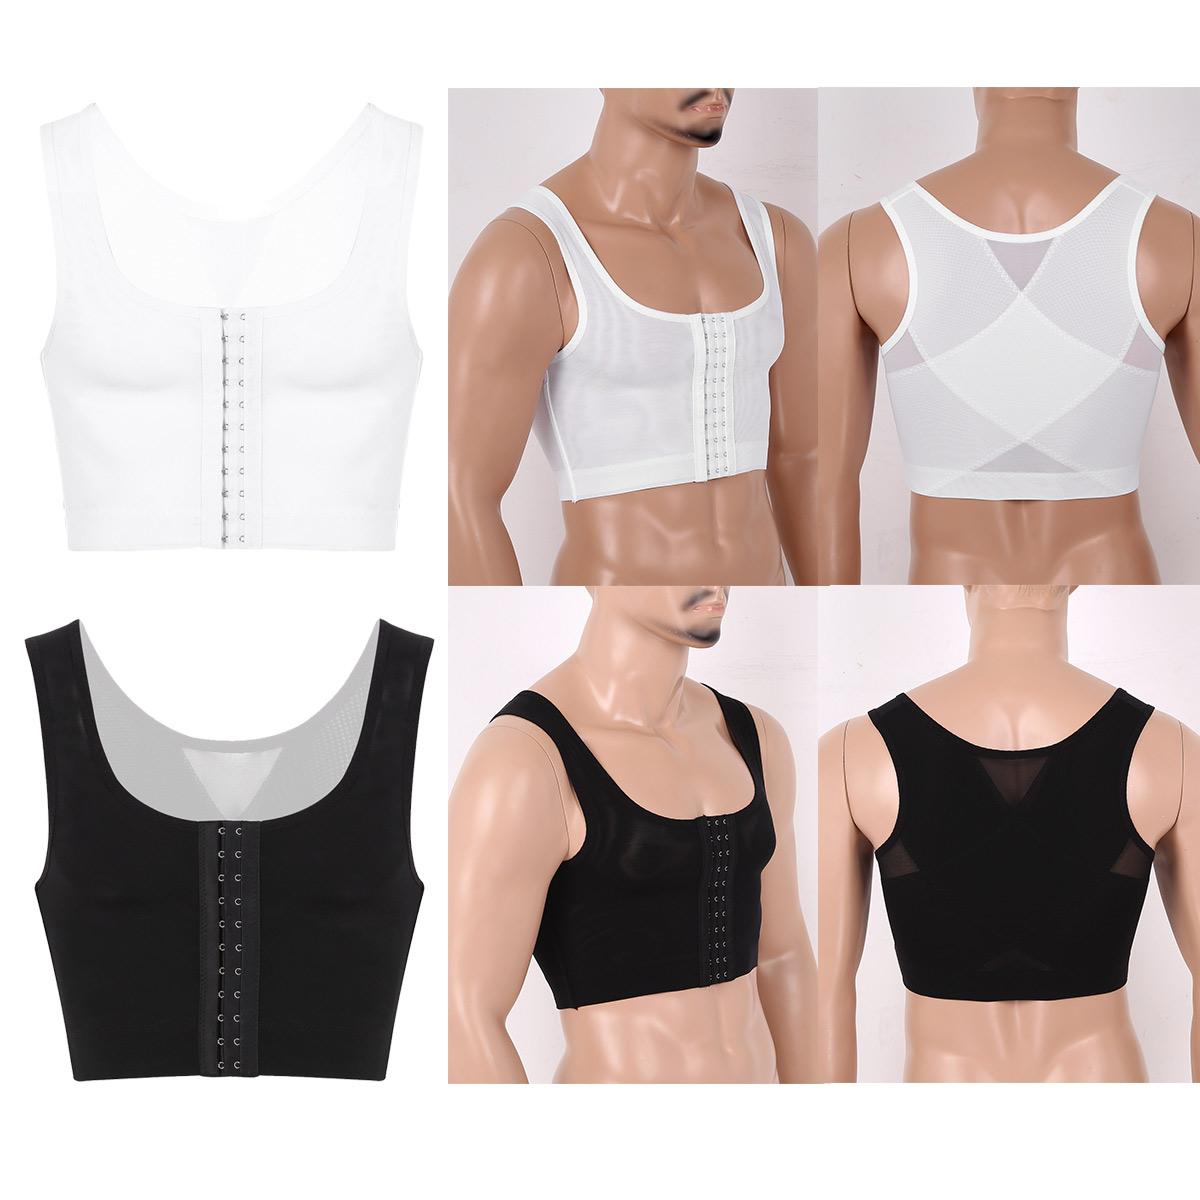 Mens/'s Shapewear Gynecomastia Compression Shirts Hide Man Moobs Lesbian Chest Binder Vest